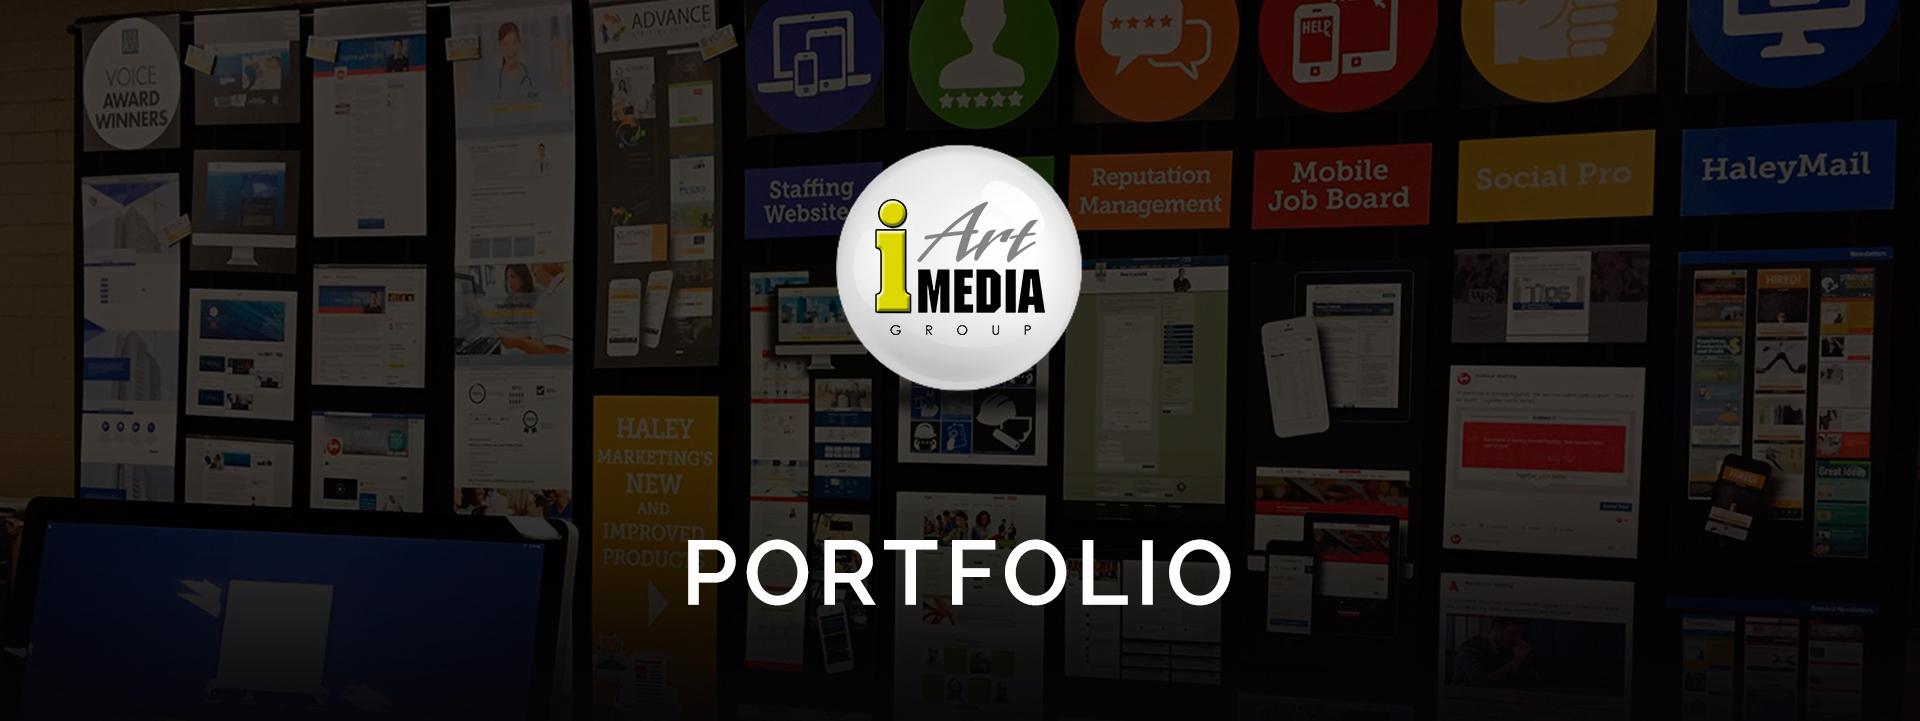 ban_portafolio